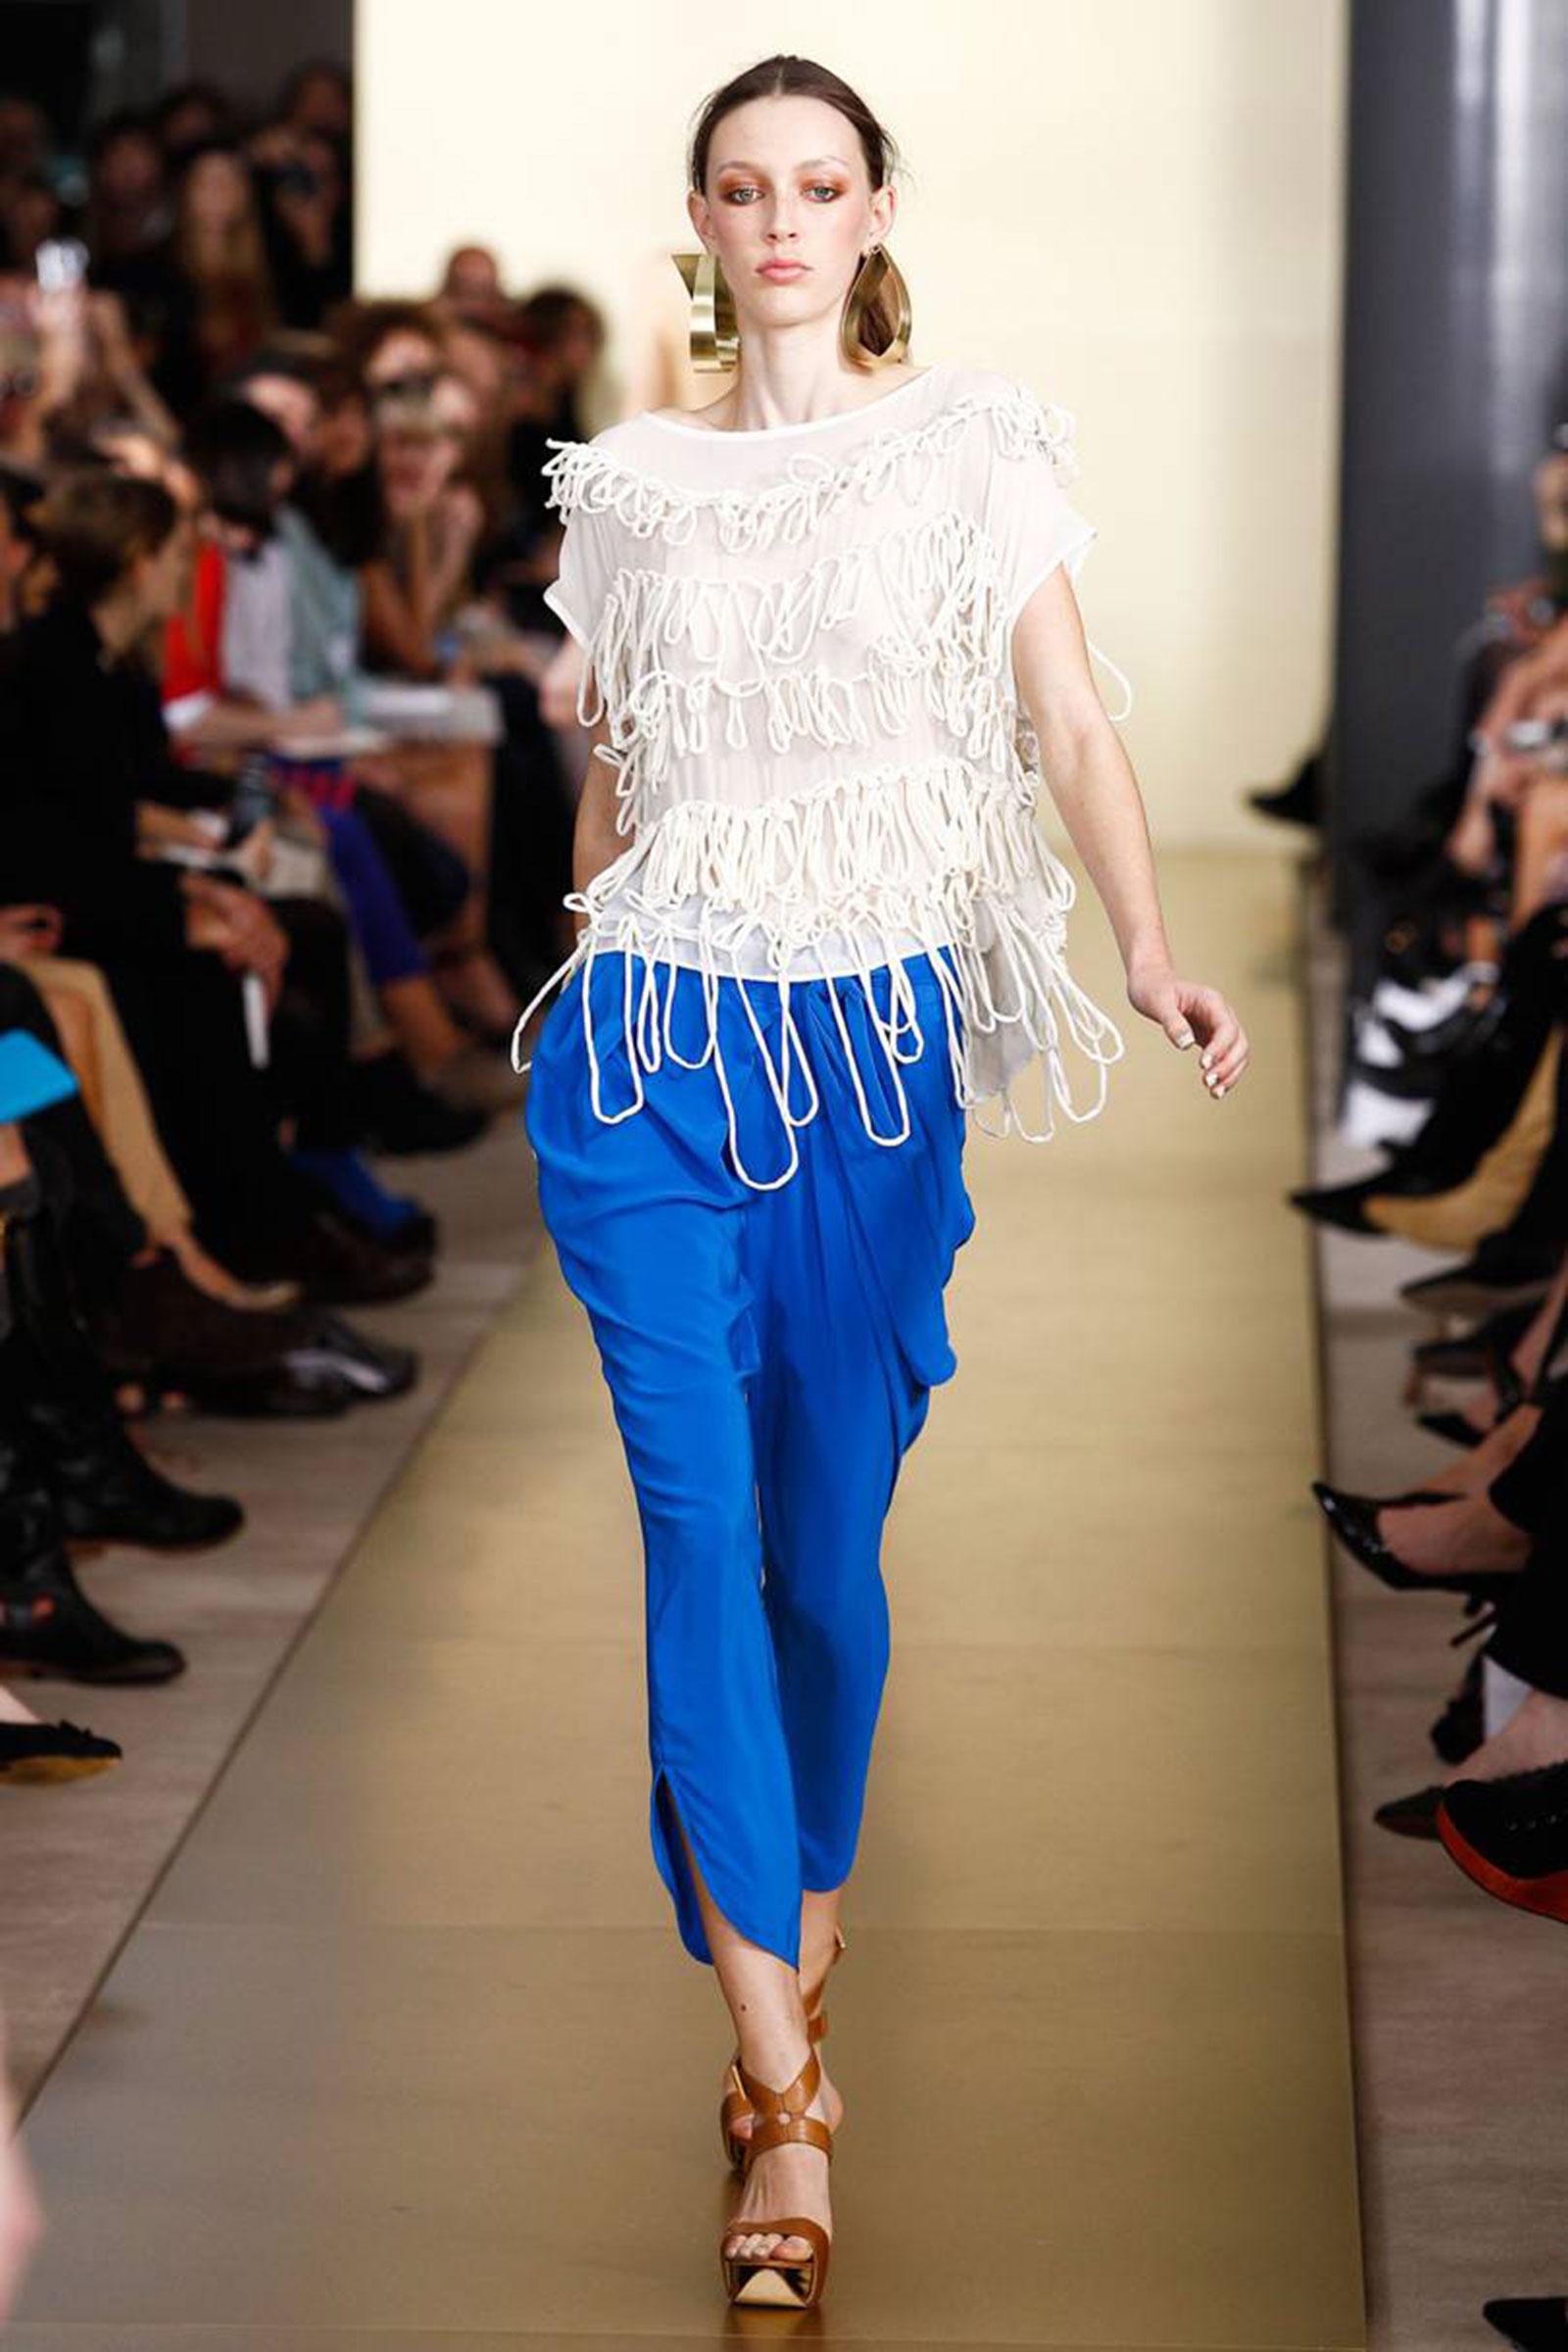 The_Ink_Collecive_Australian_Fashion_2011_32.jpg